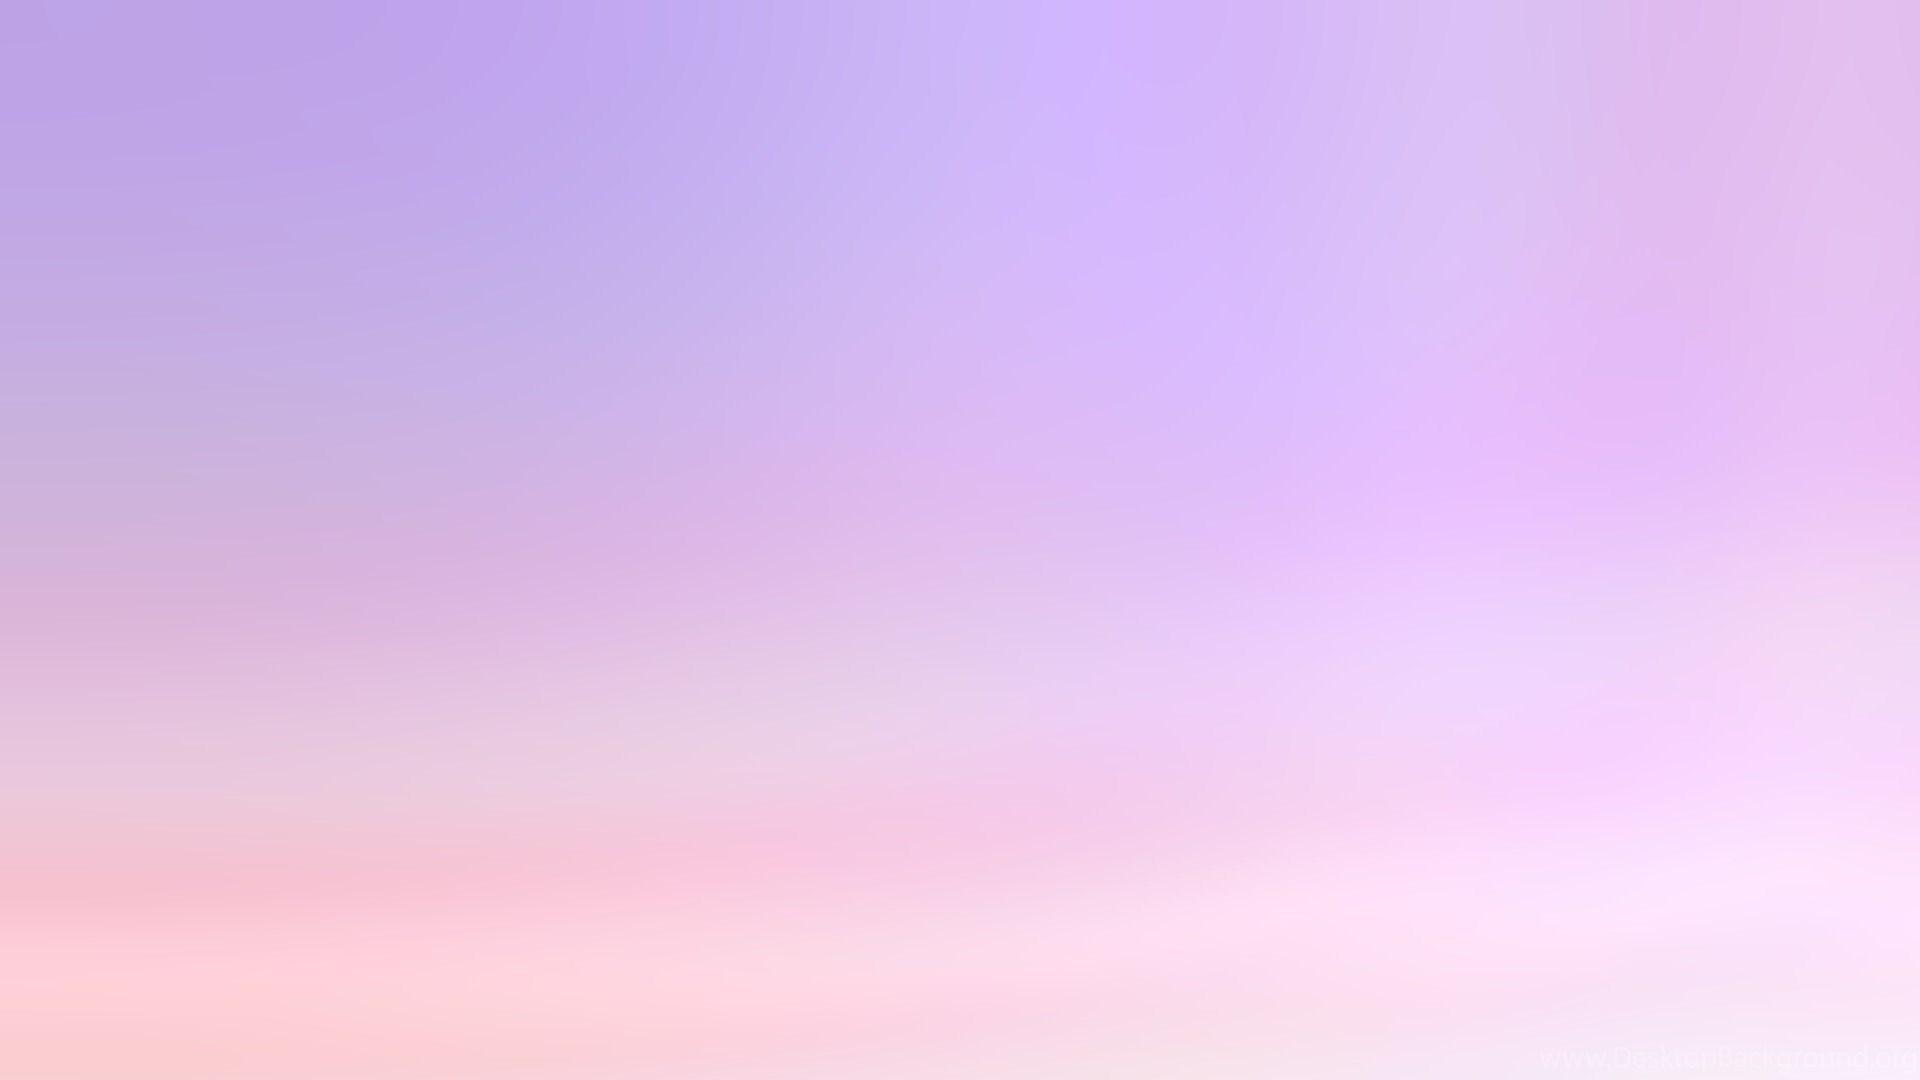 Pastel Gradient Backgrounds Tumblr Wallpaper Desktop Background